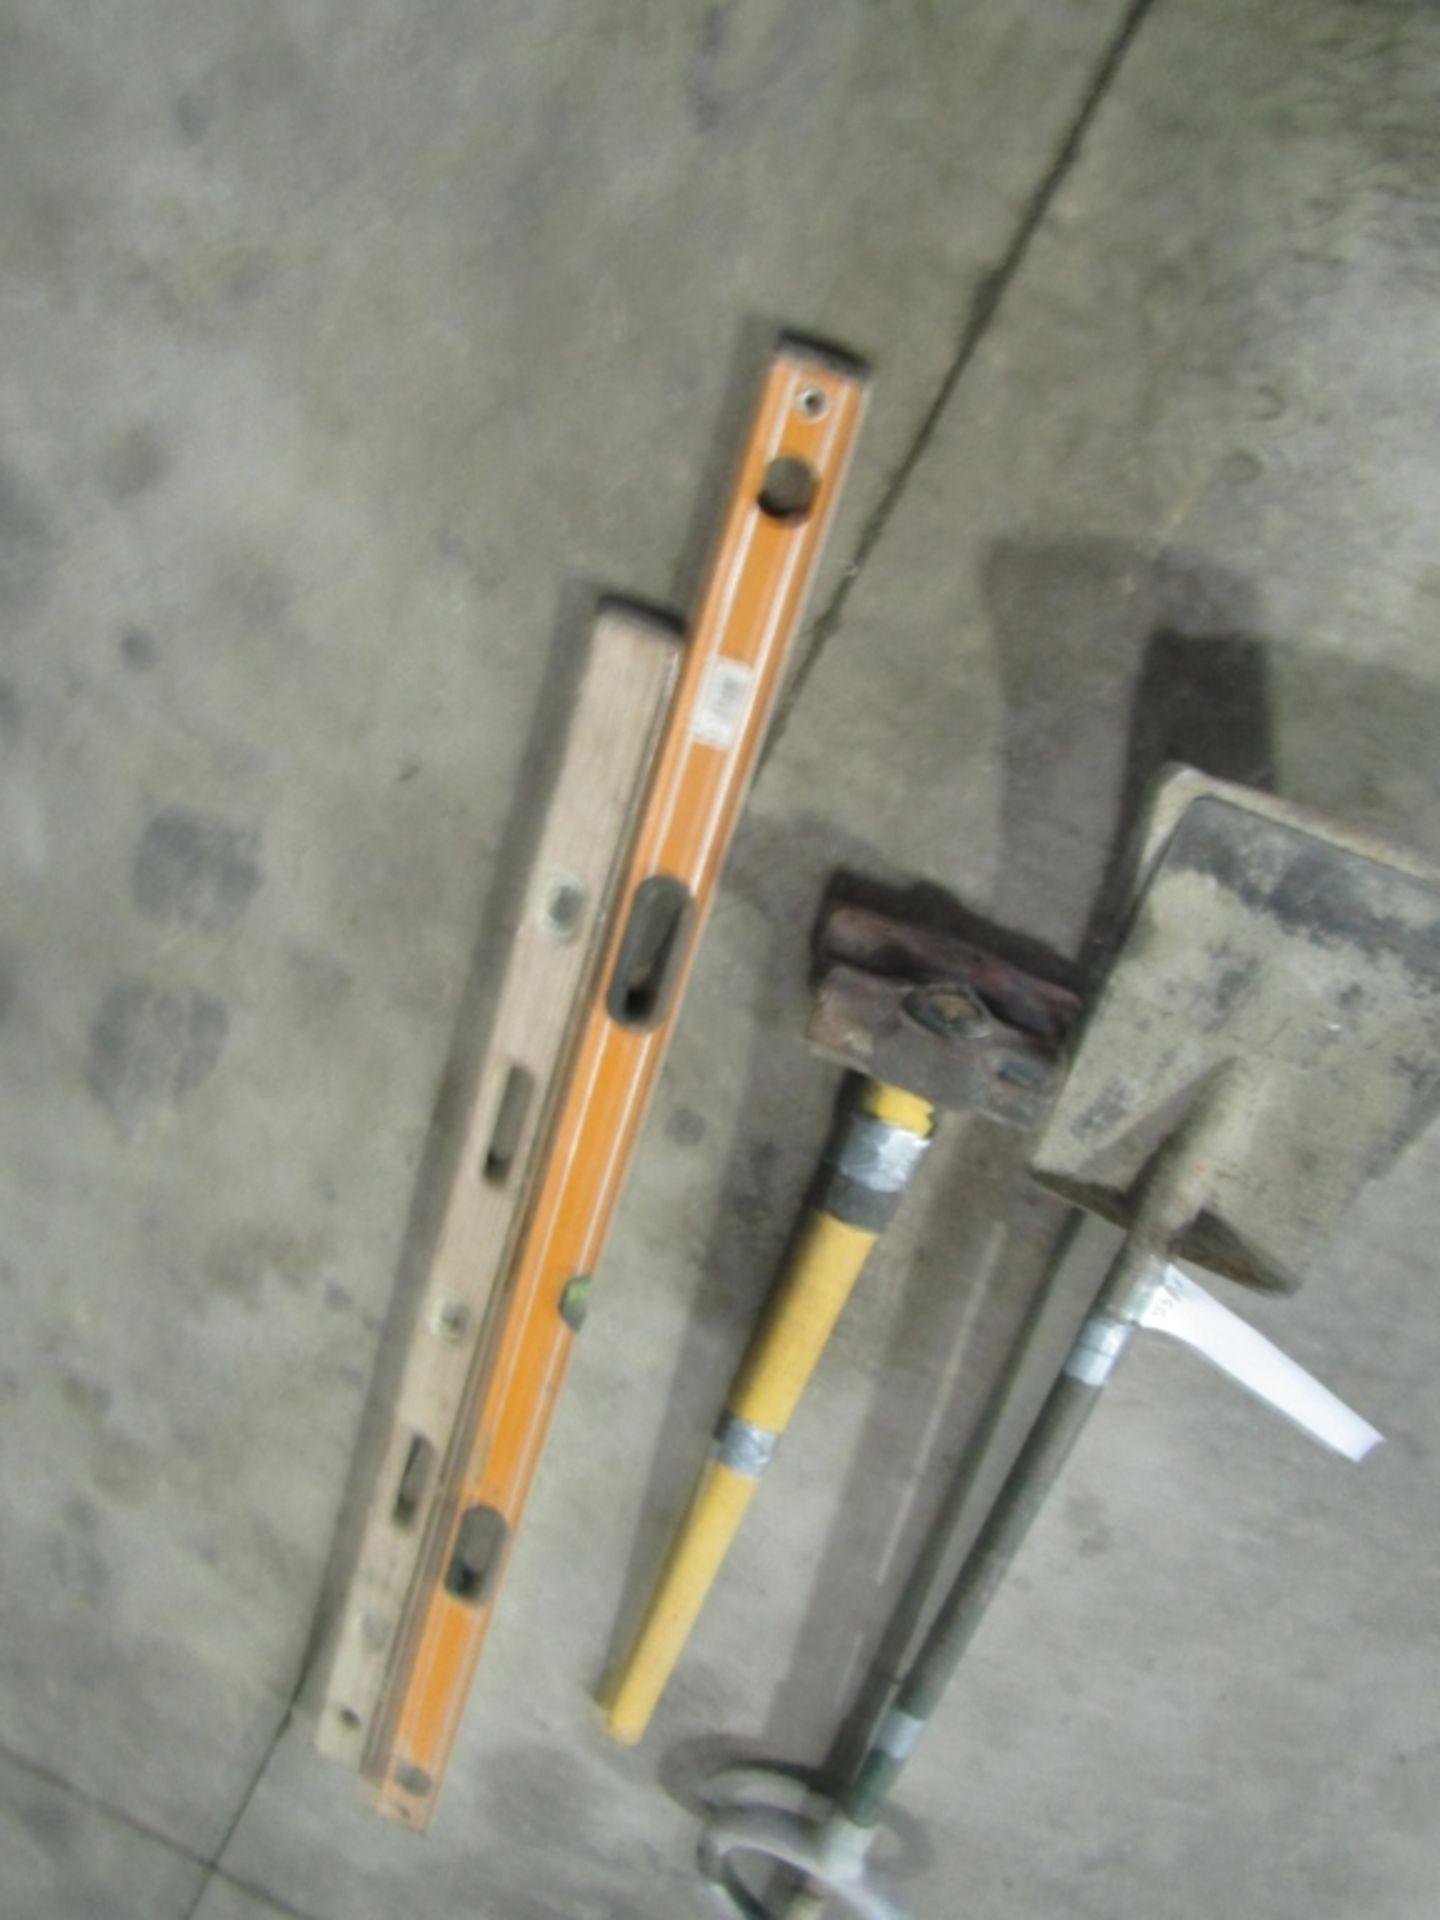 Lot 233 - (2) Levels, (2) Shovels & (2) Sledgehammer, Located in Winterset, IA